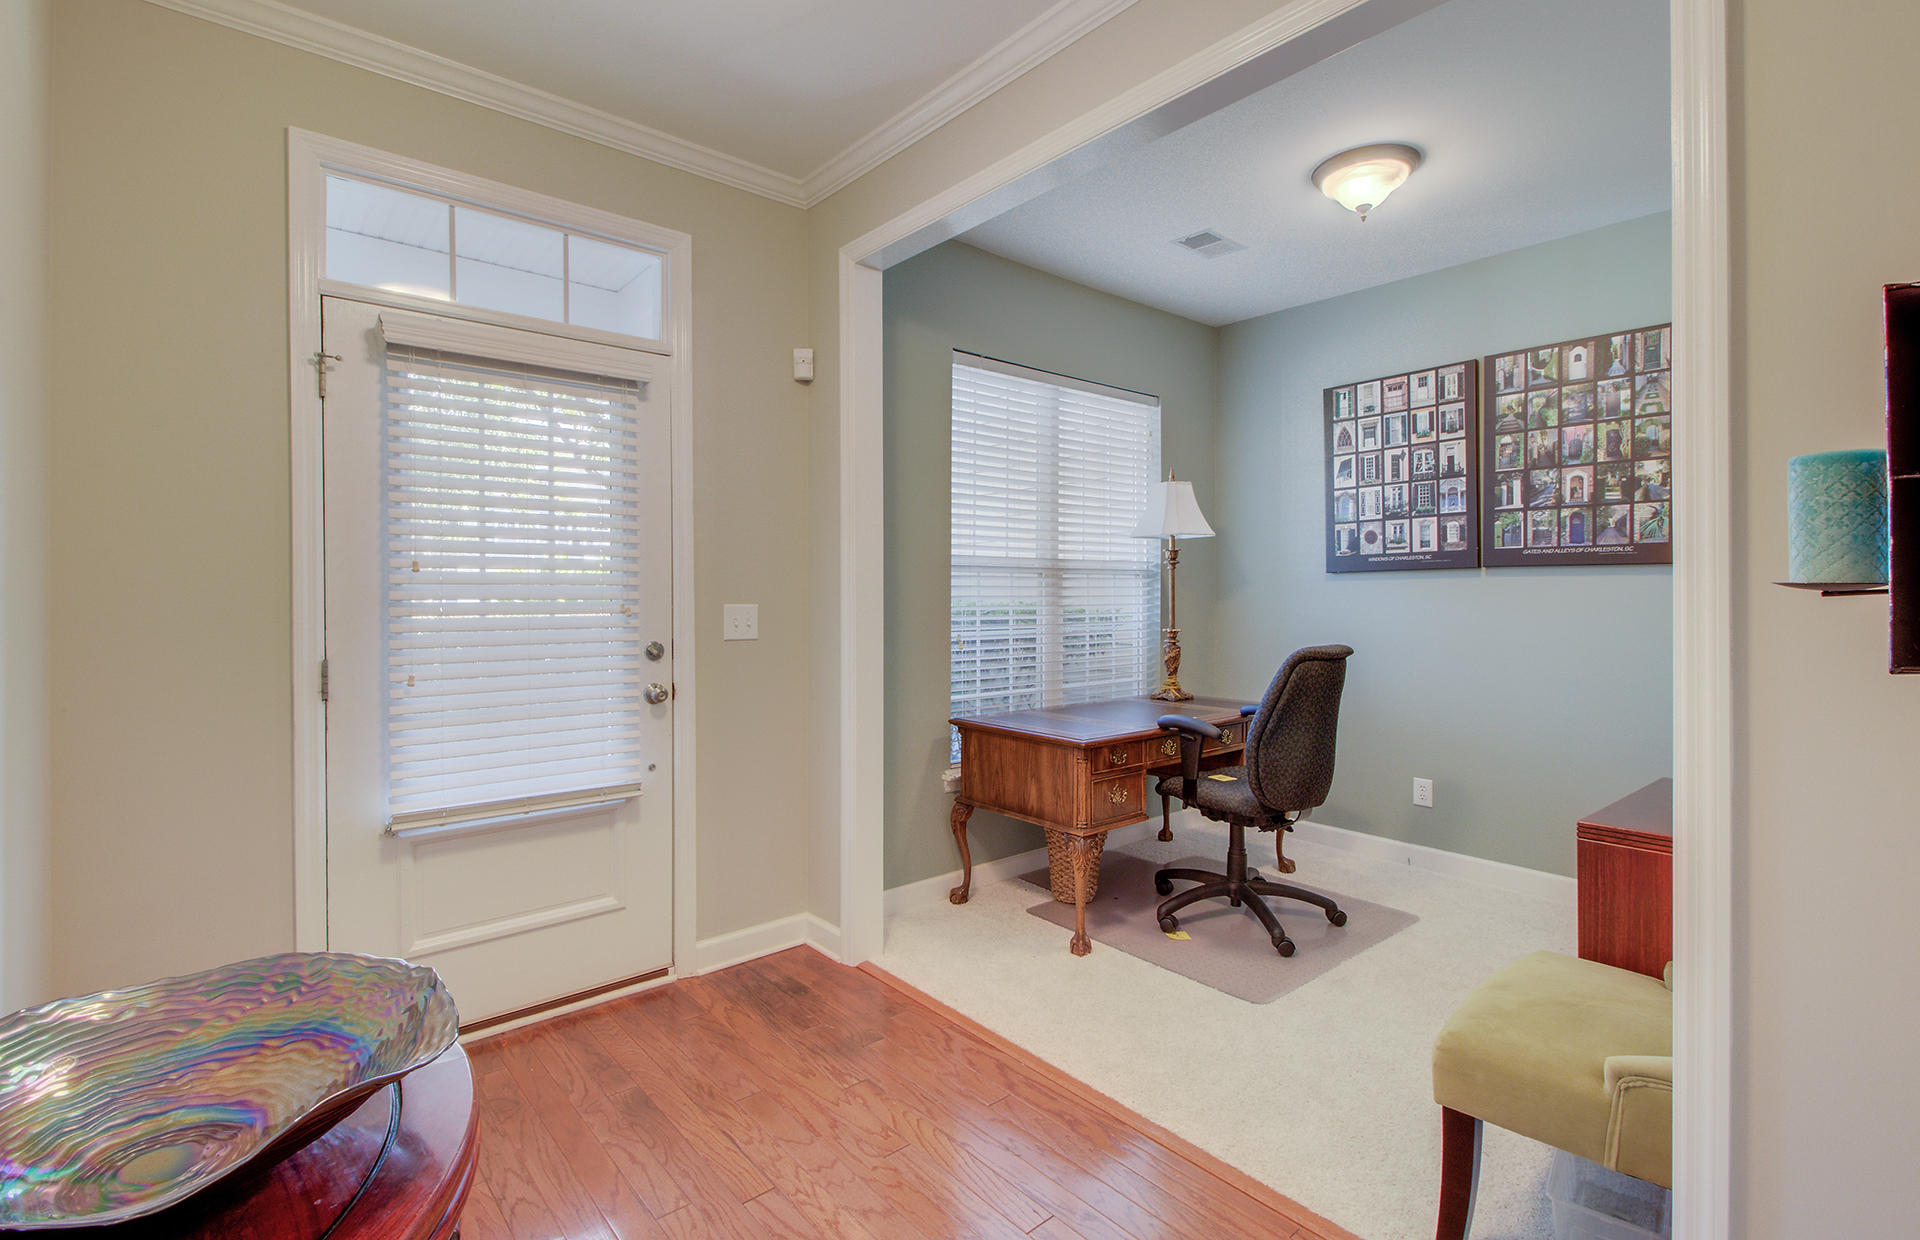 Dunes West Homes For Sale - 145 Fresh Meadow, Mount Pleasant, SC - 5